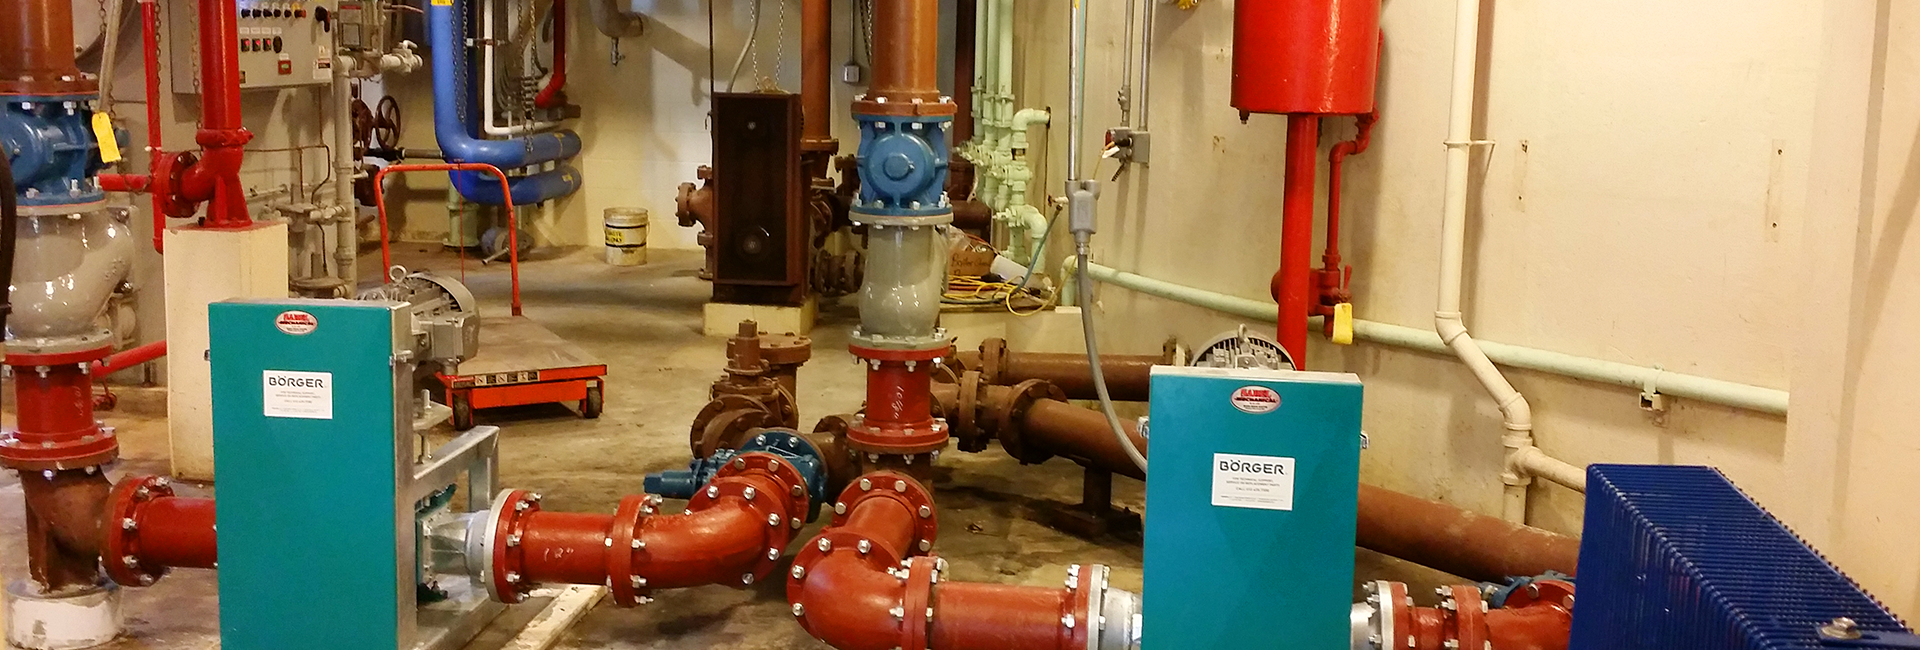 Sabel Mechanical LLC | Plumbing | Fond du Lac, WI